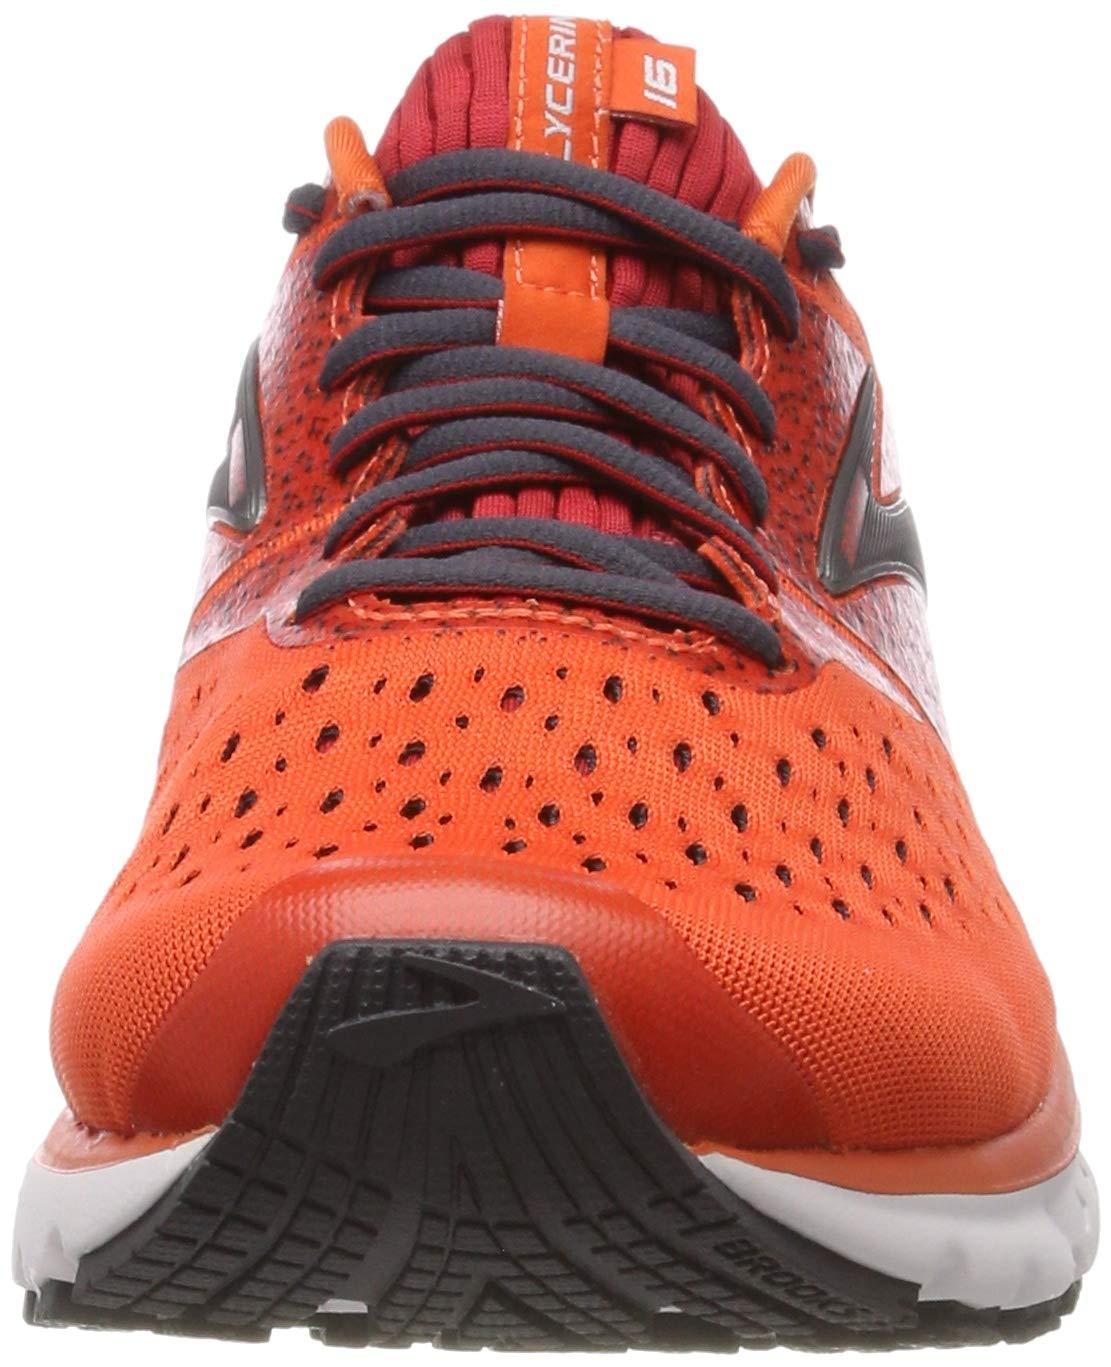 71LRrpBOPEL - Brooks Men's Glycerin 16 Running Shoes